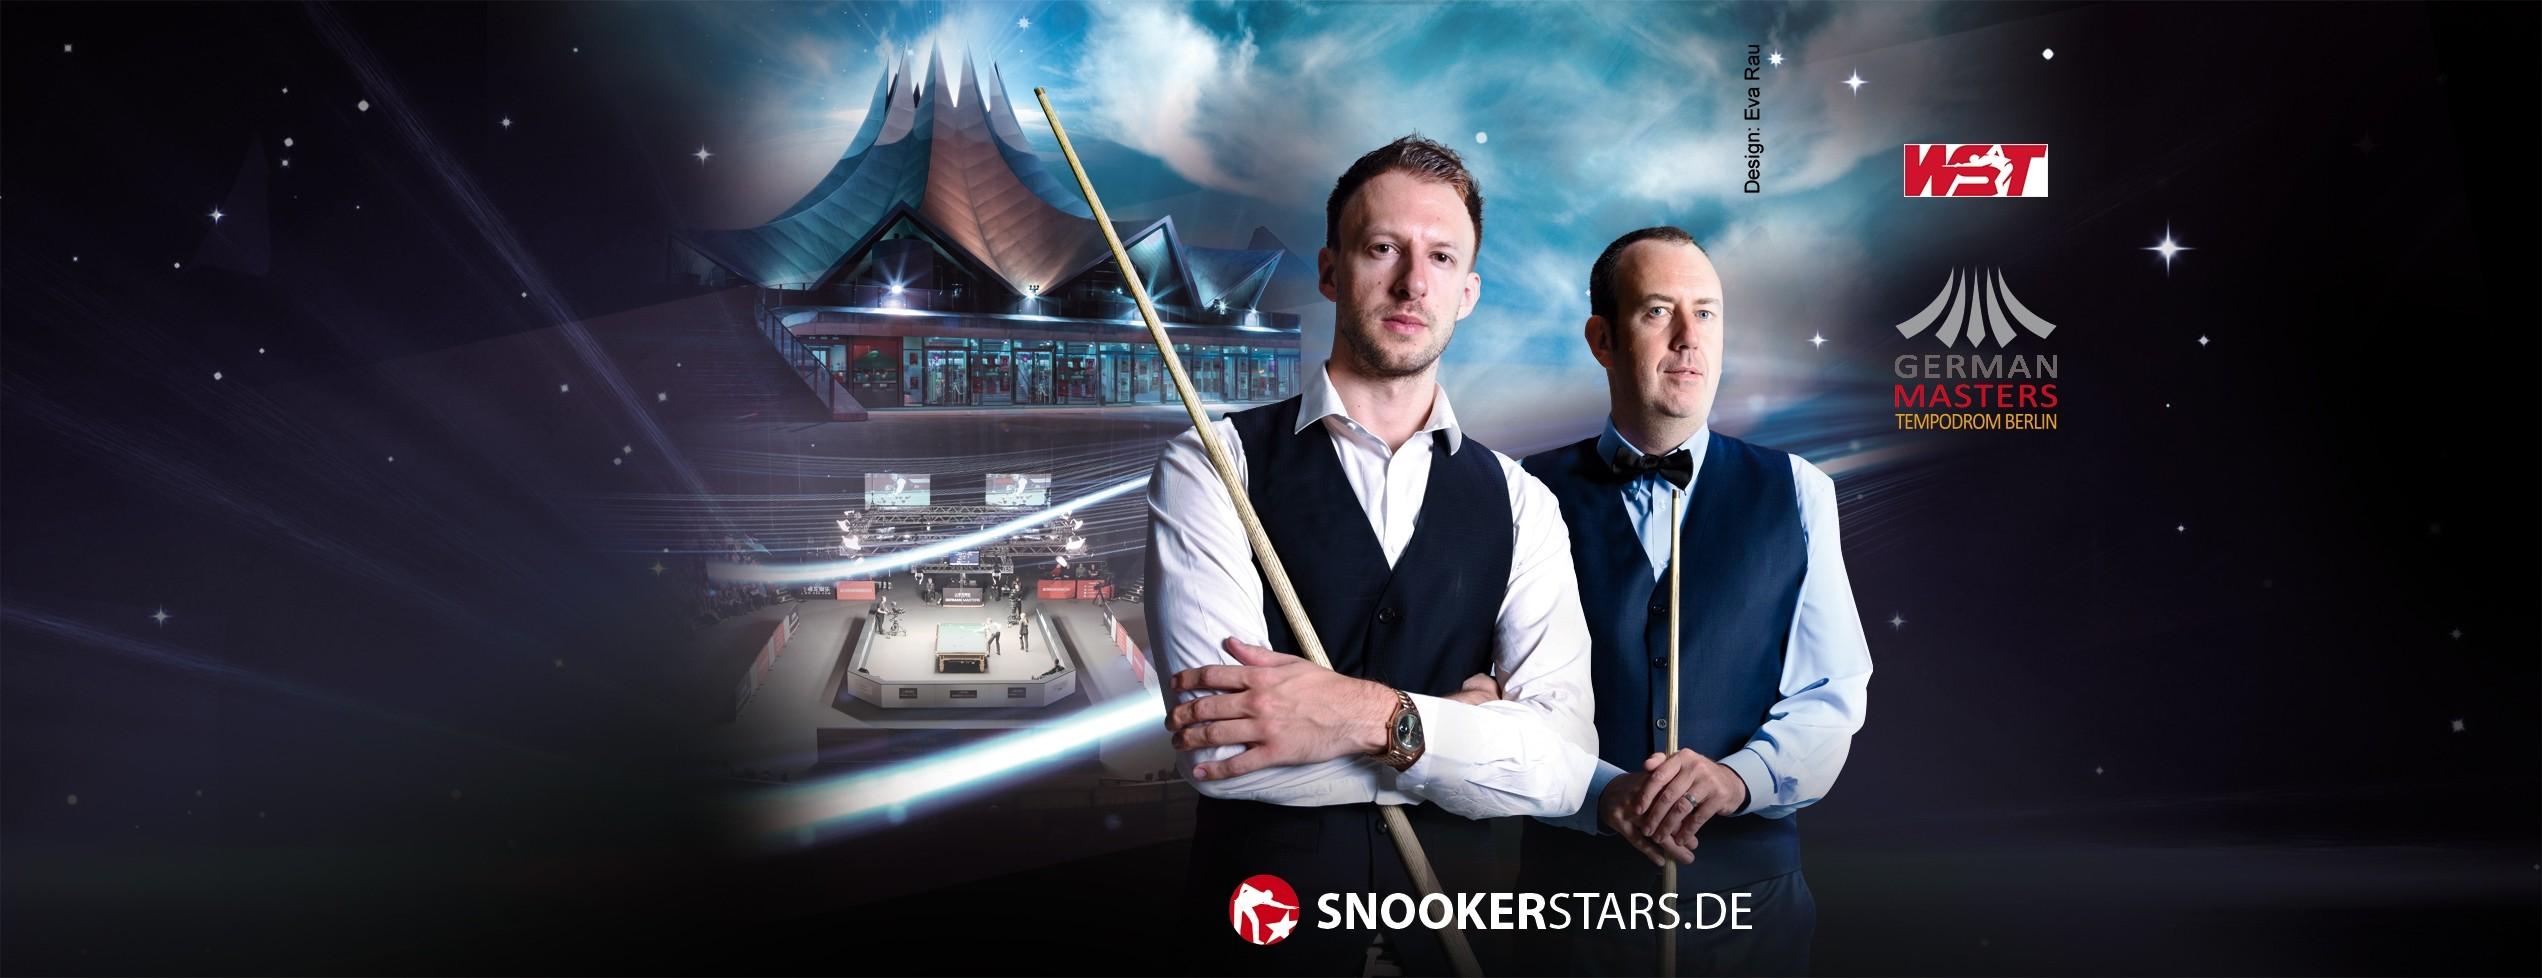 German Masters 29.01.2022 KAT 2 Abend-Session